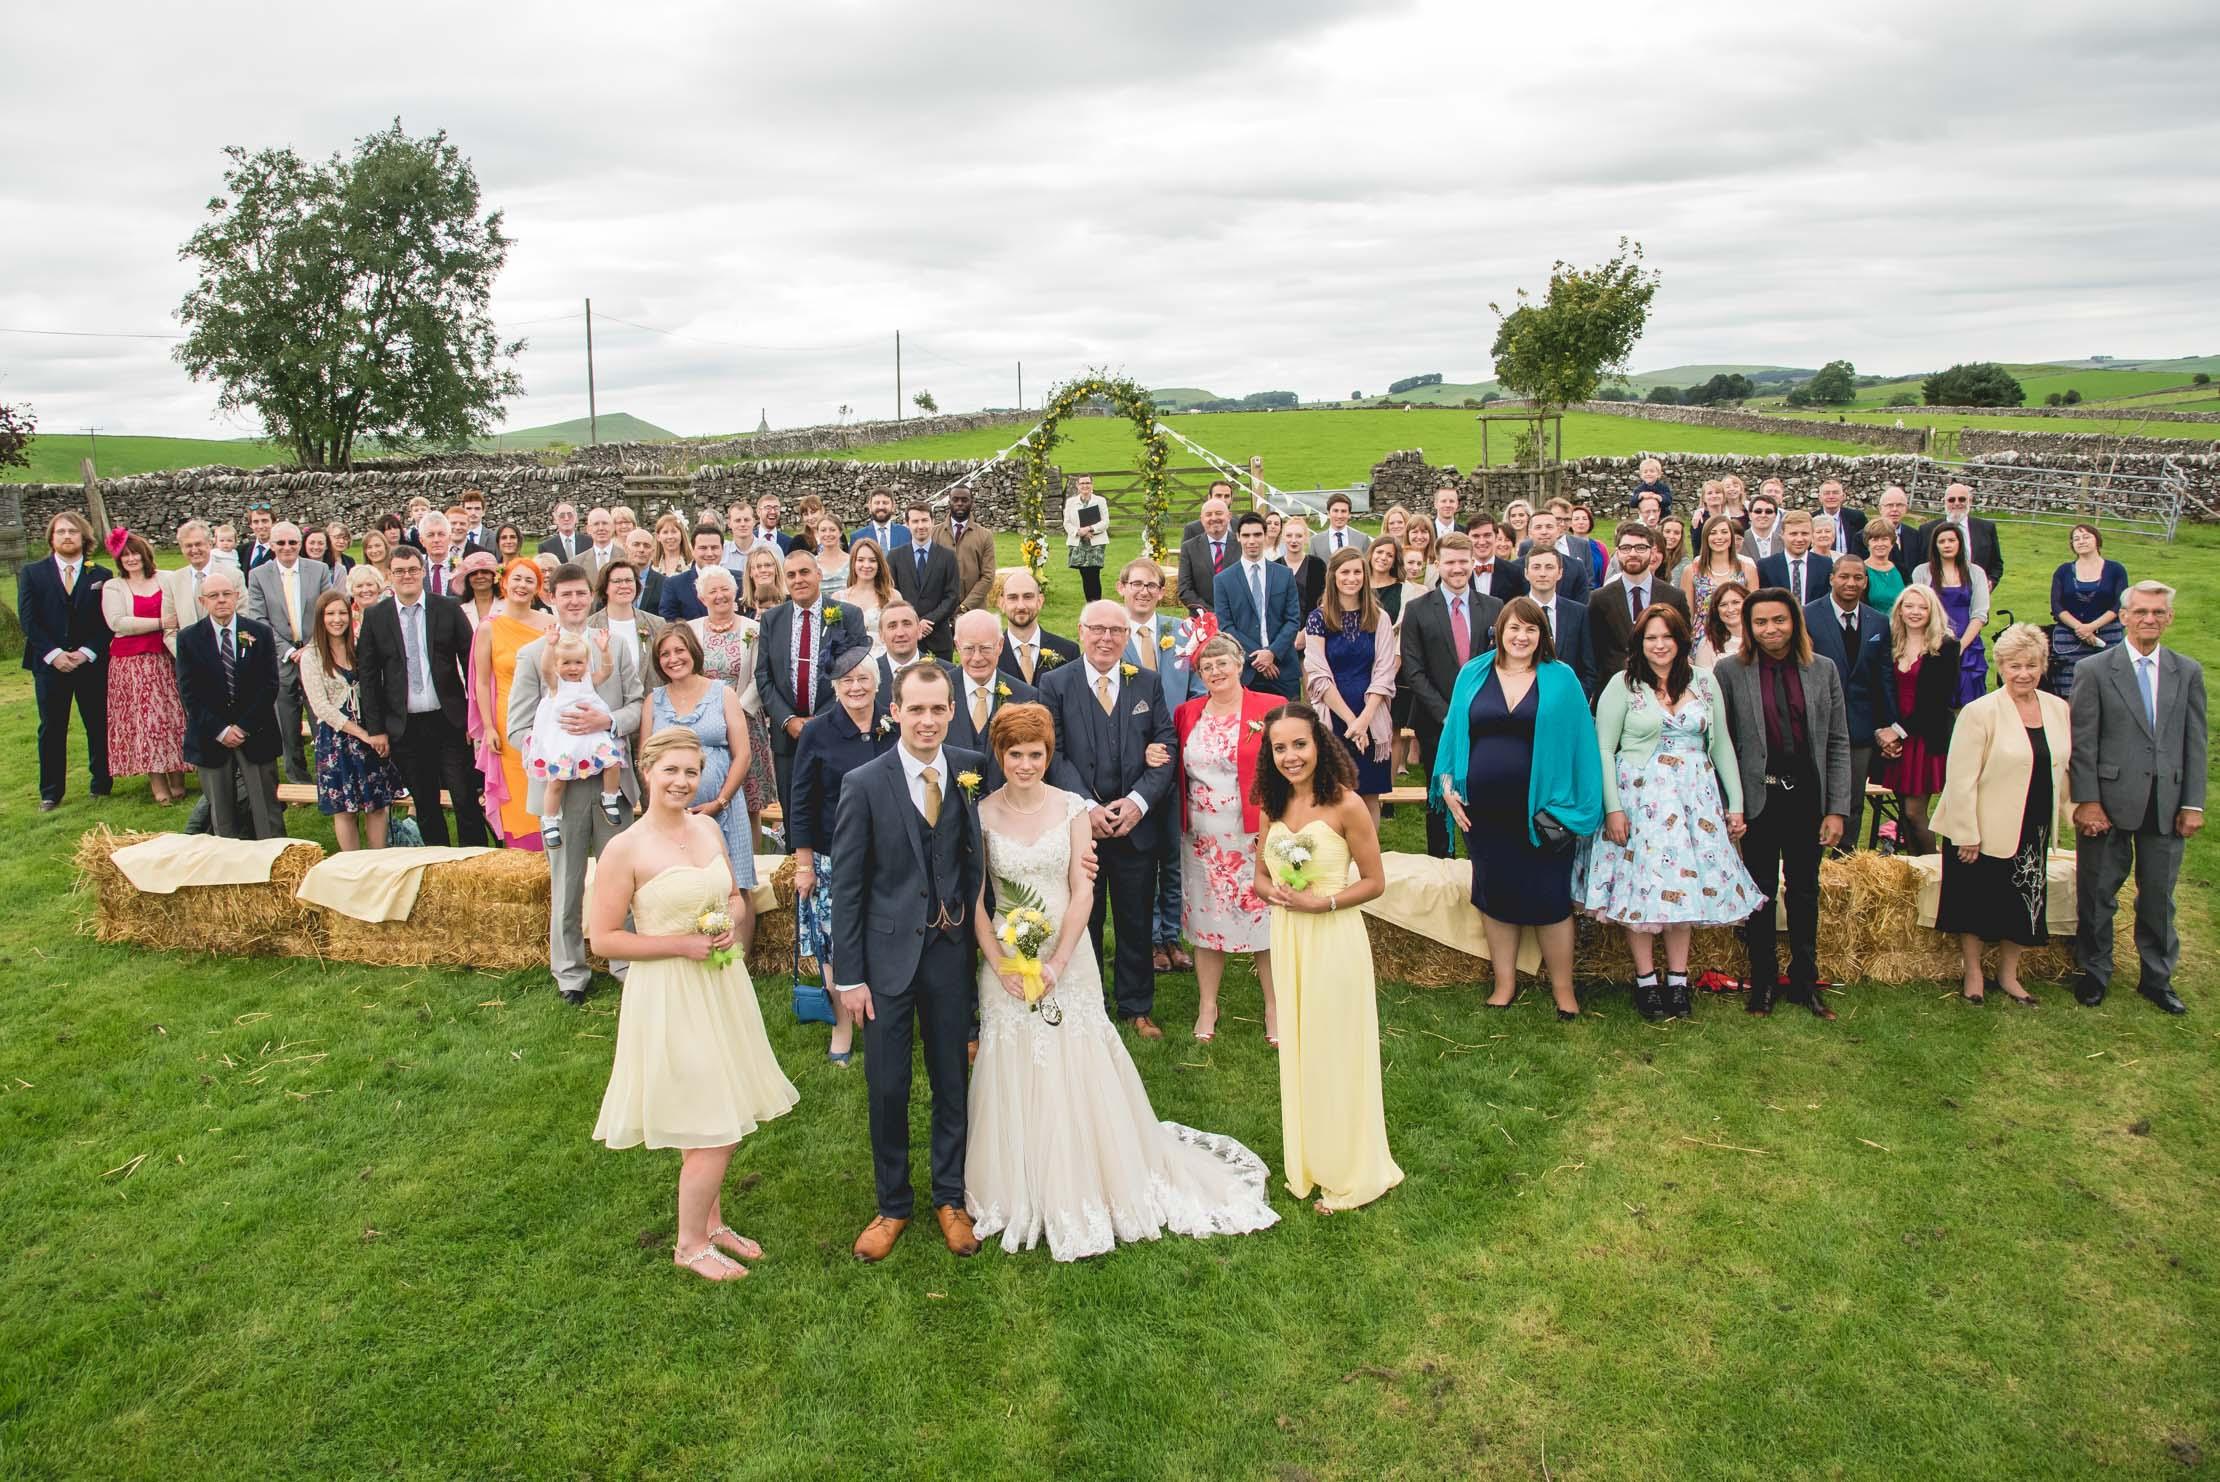 Peak+district+farm+wedding+lower+damgate+photographer-141.jpg